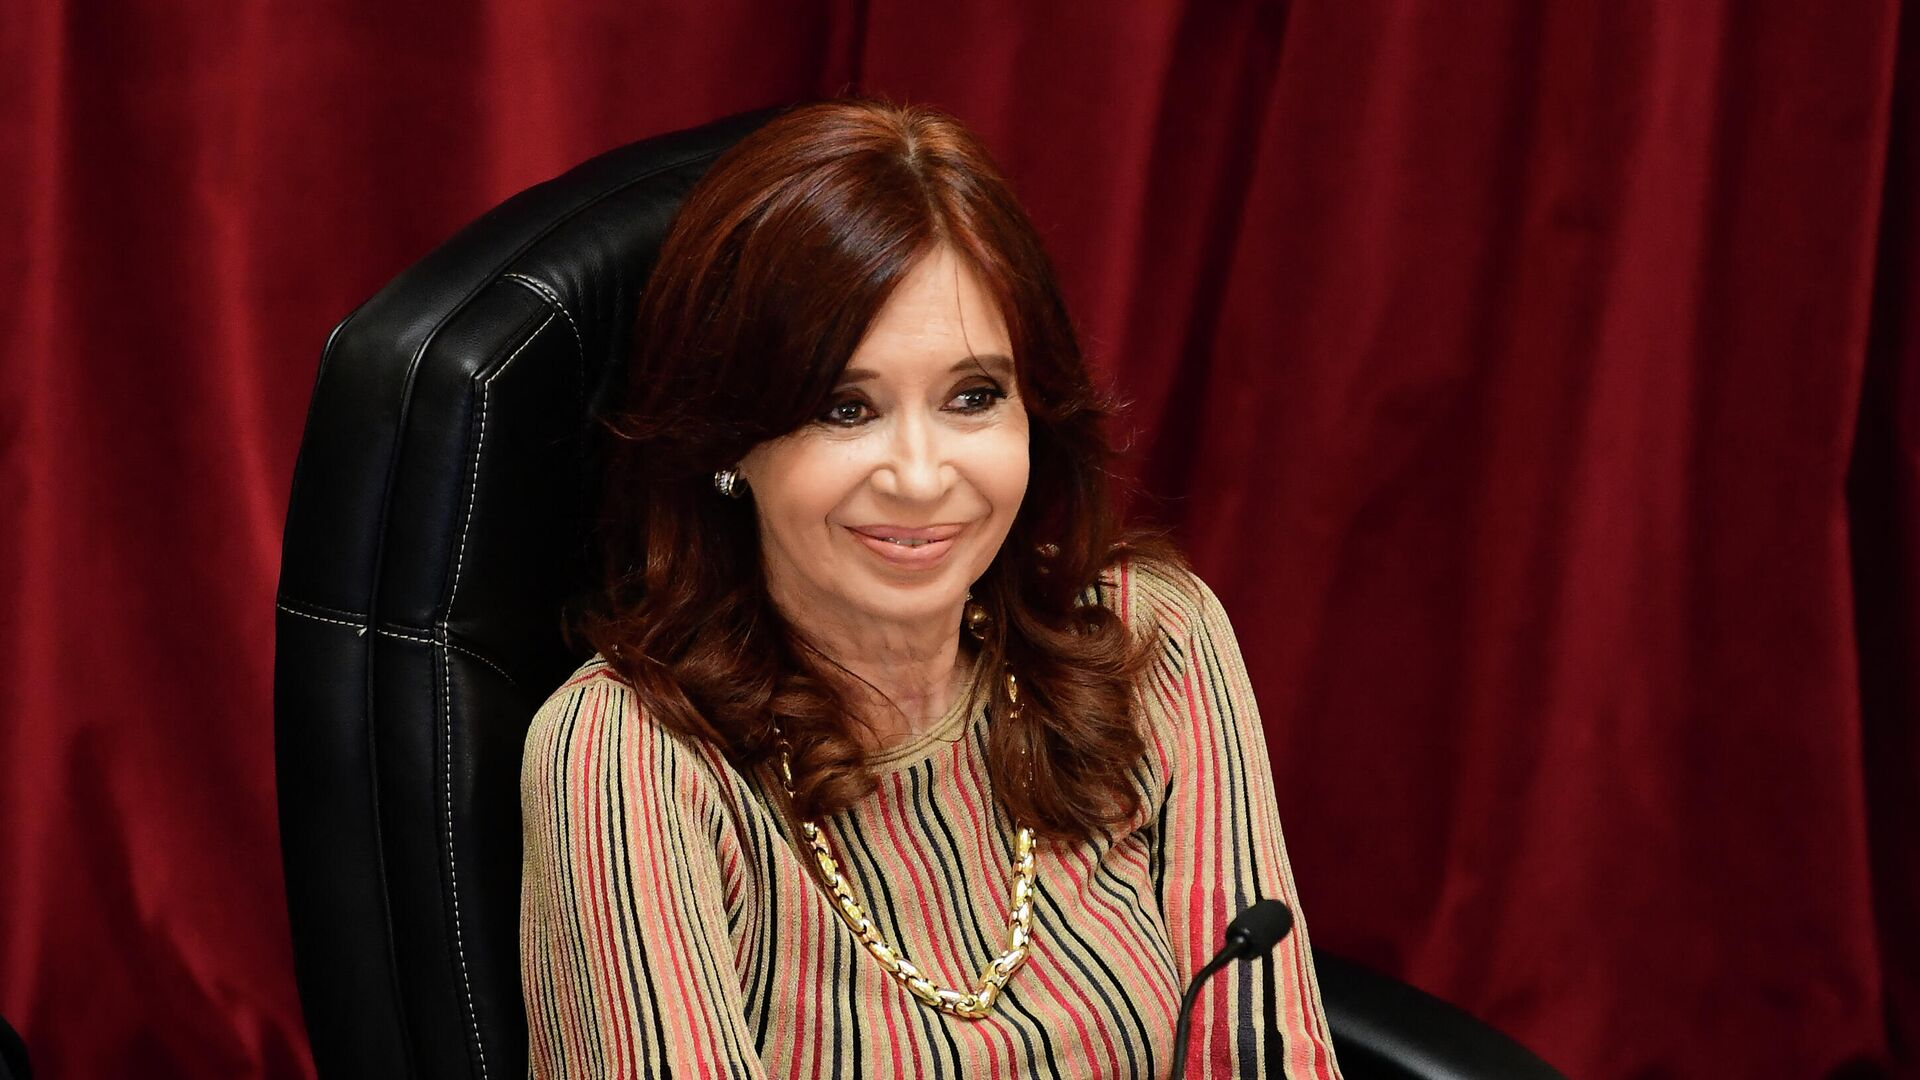 Cristina Fernández de Kirchner, vicepresidenta argentina  - Sputnik Mundo, 1920, 15.09.2021